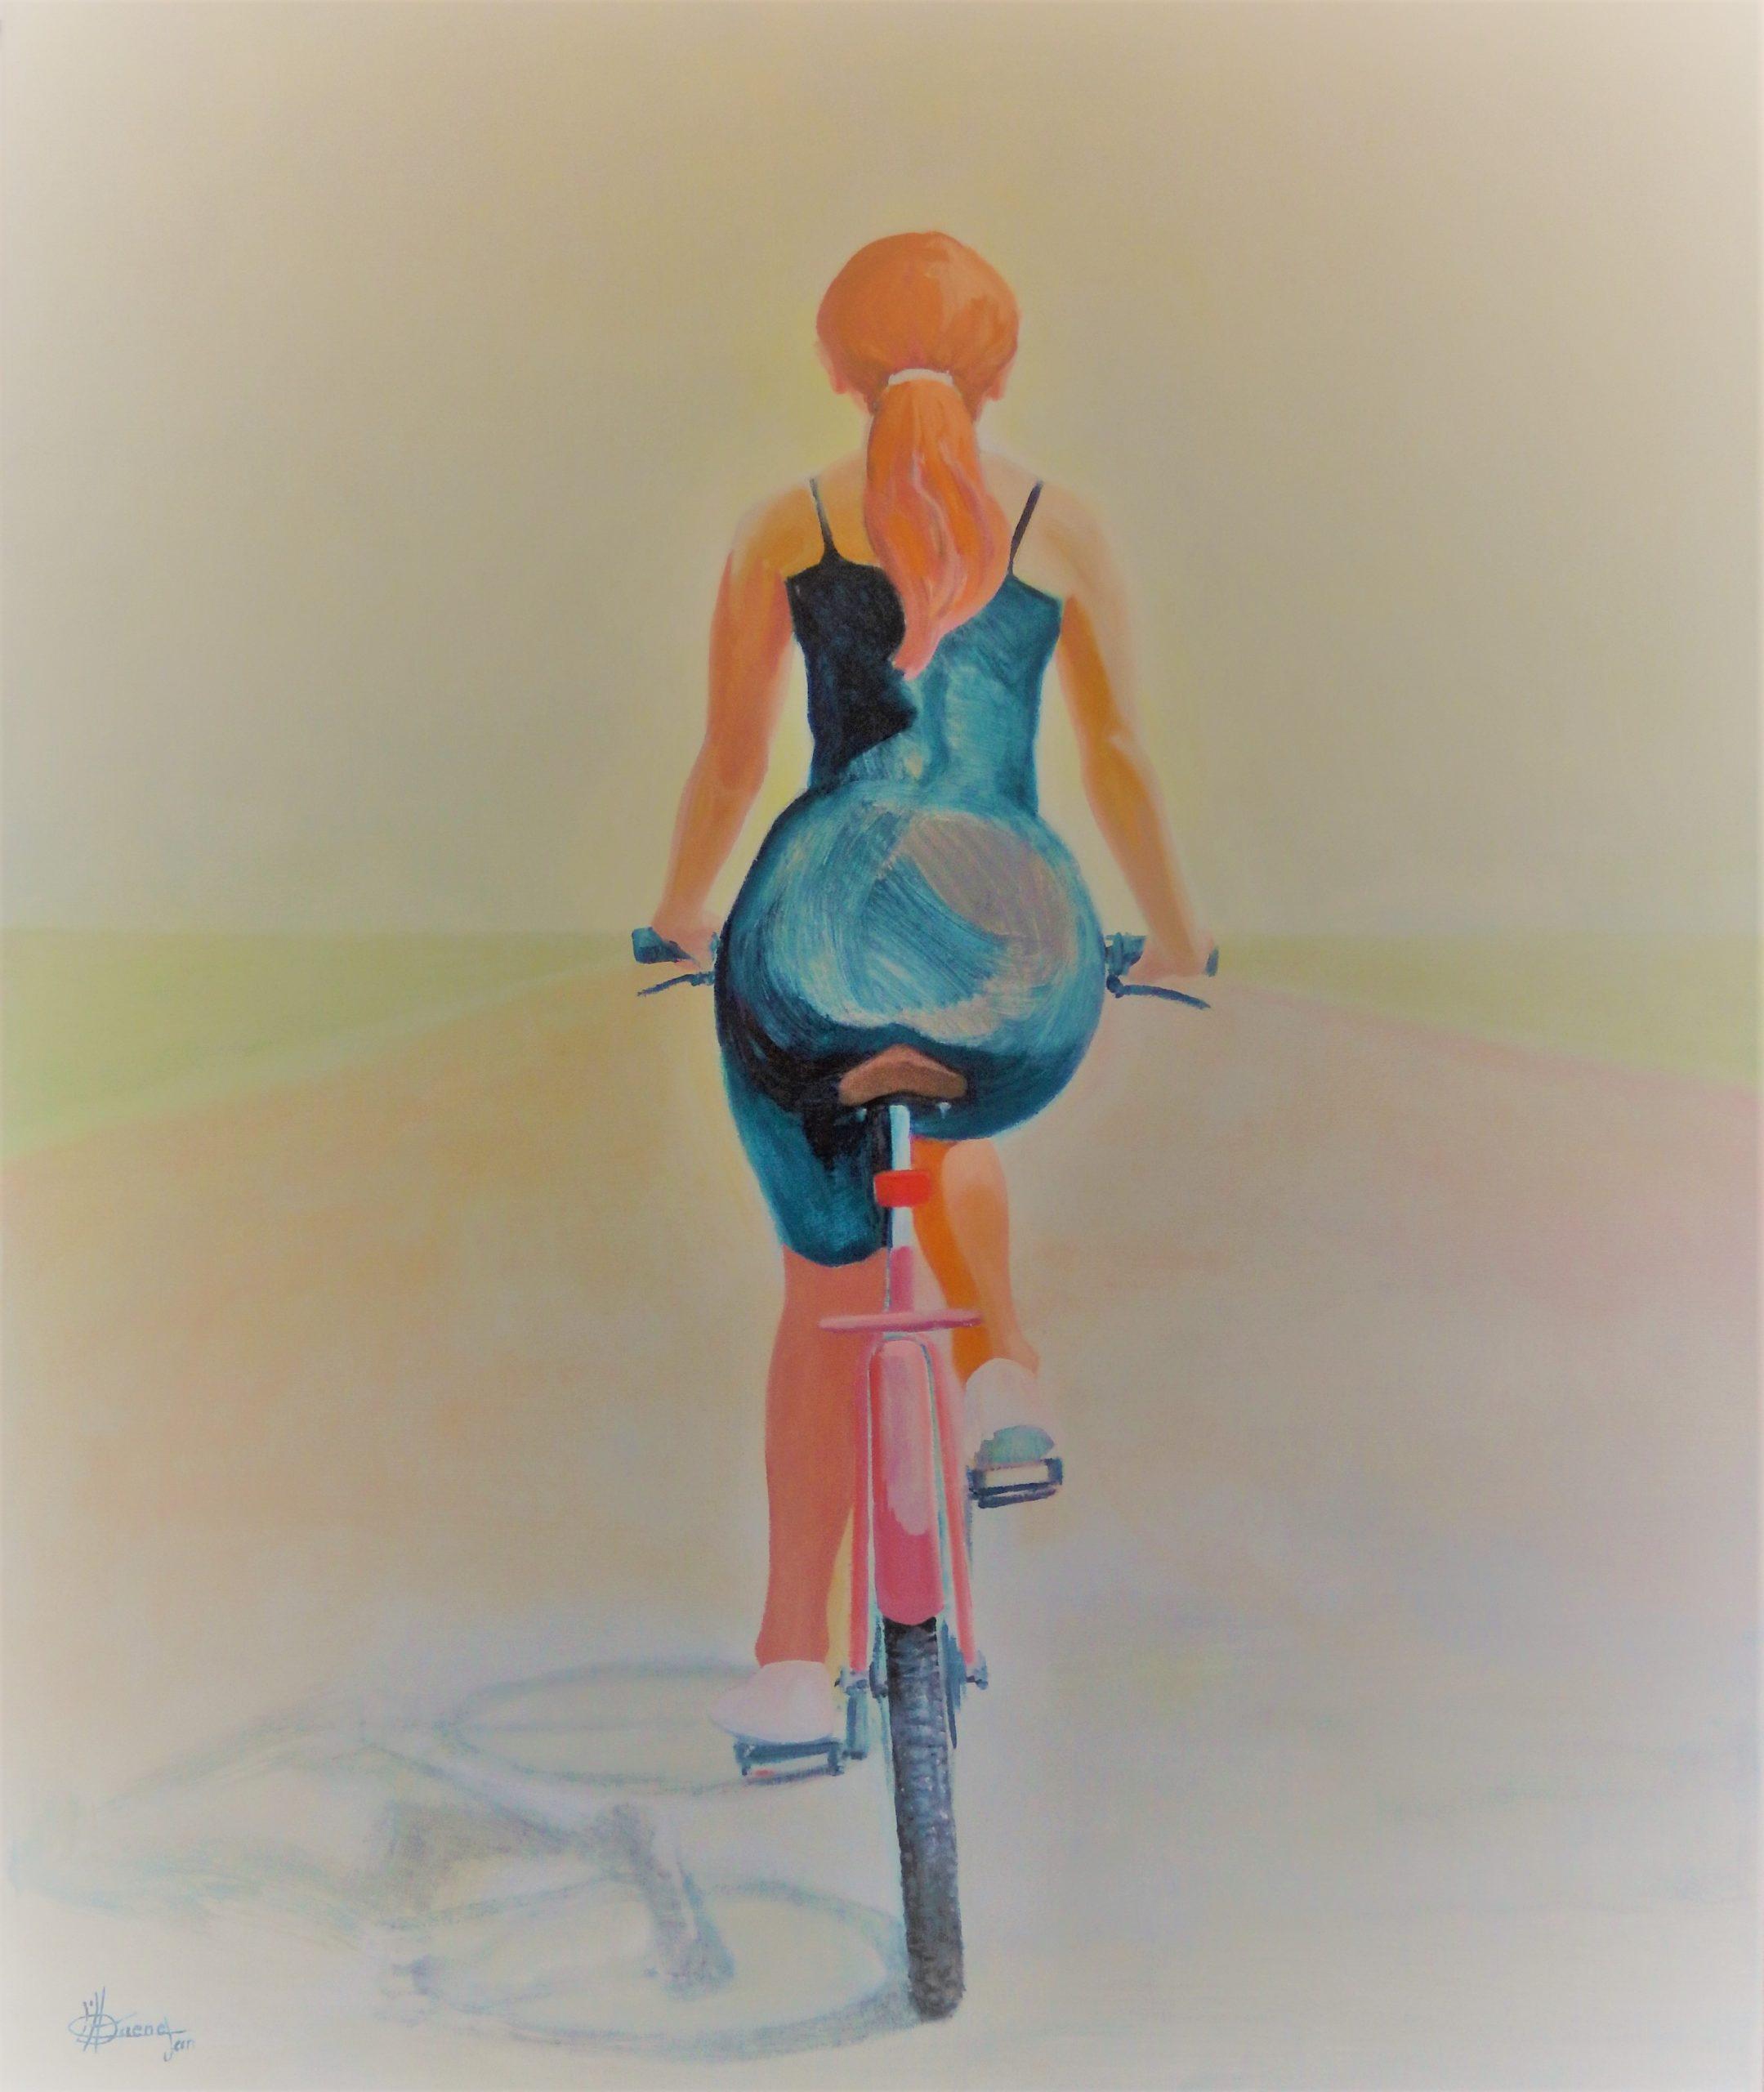 785 cycliste